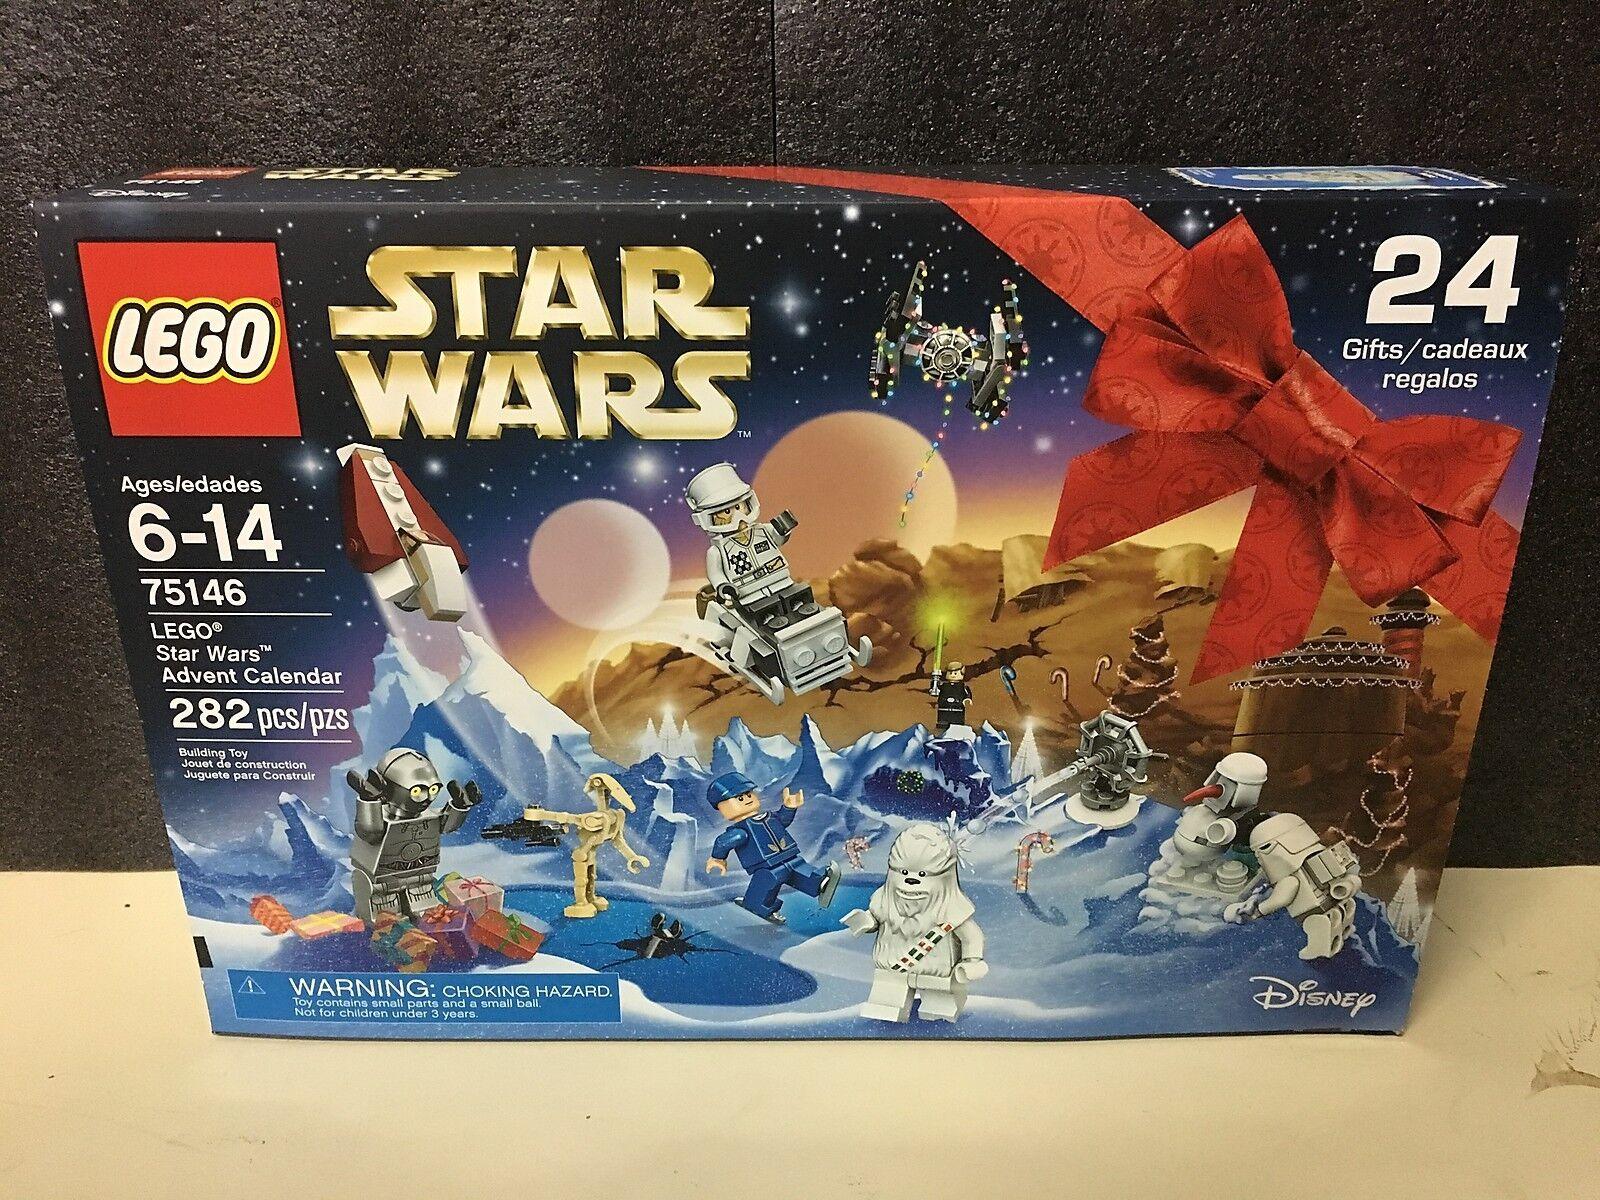 NEW Lego 75146 Star Wars Advent Calendar - Sealed  Hard to Find